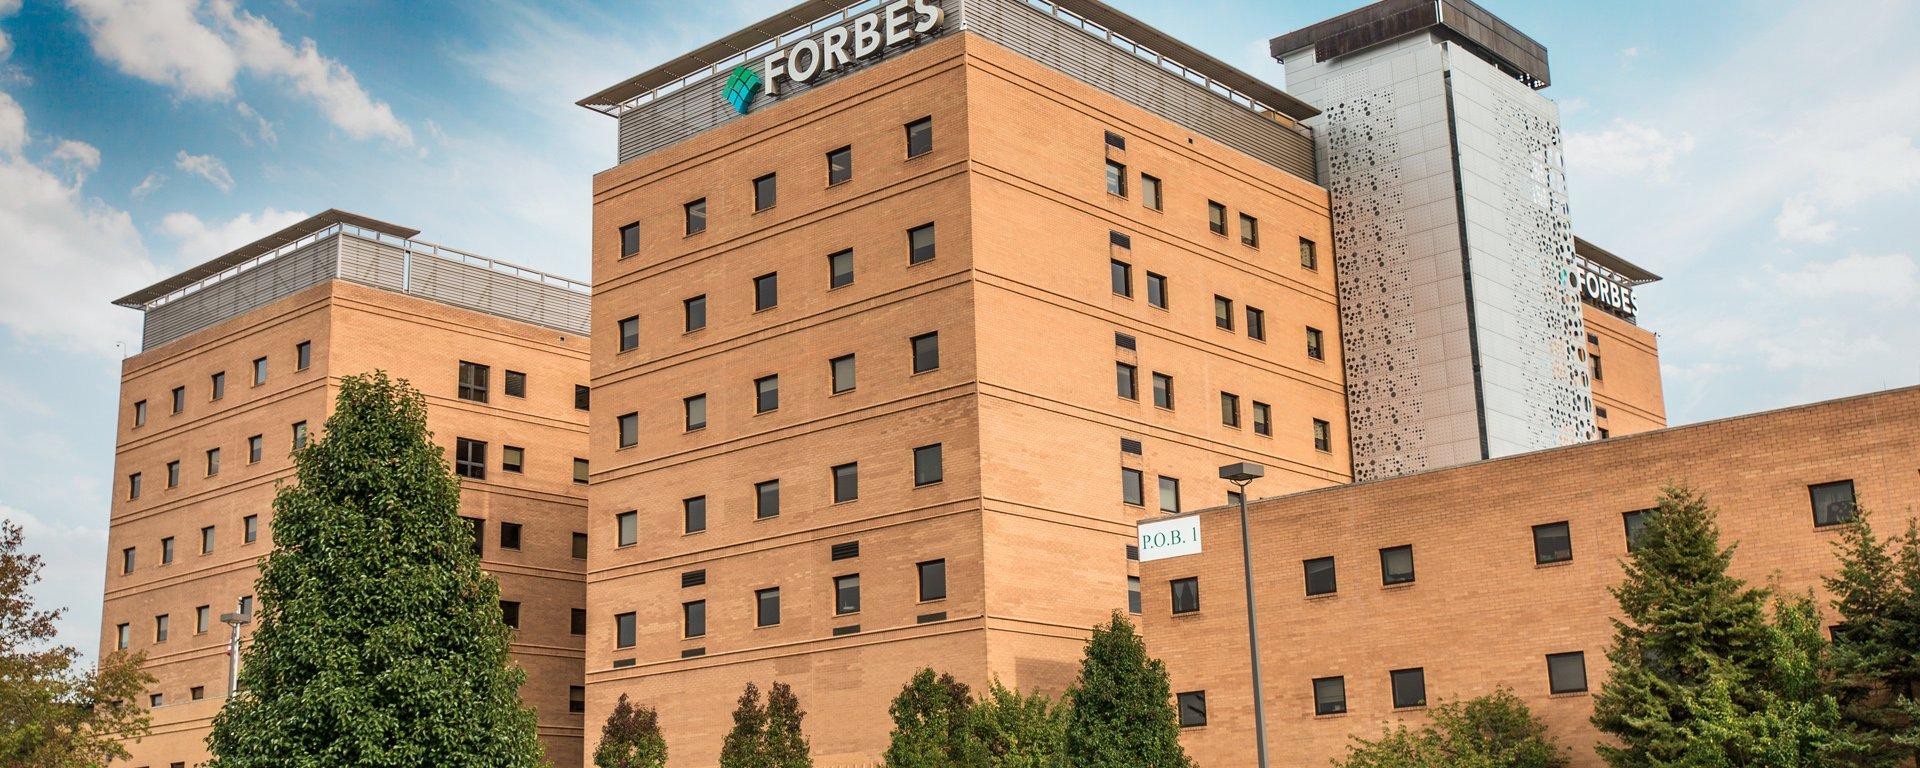 forbes-hospital